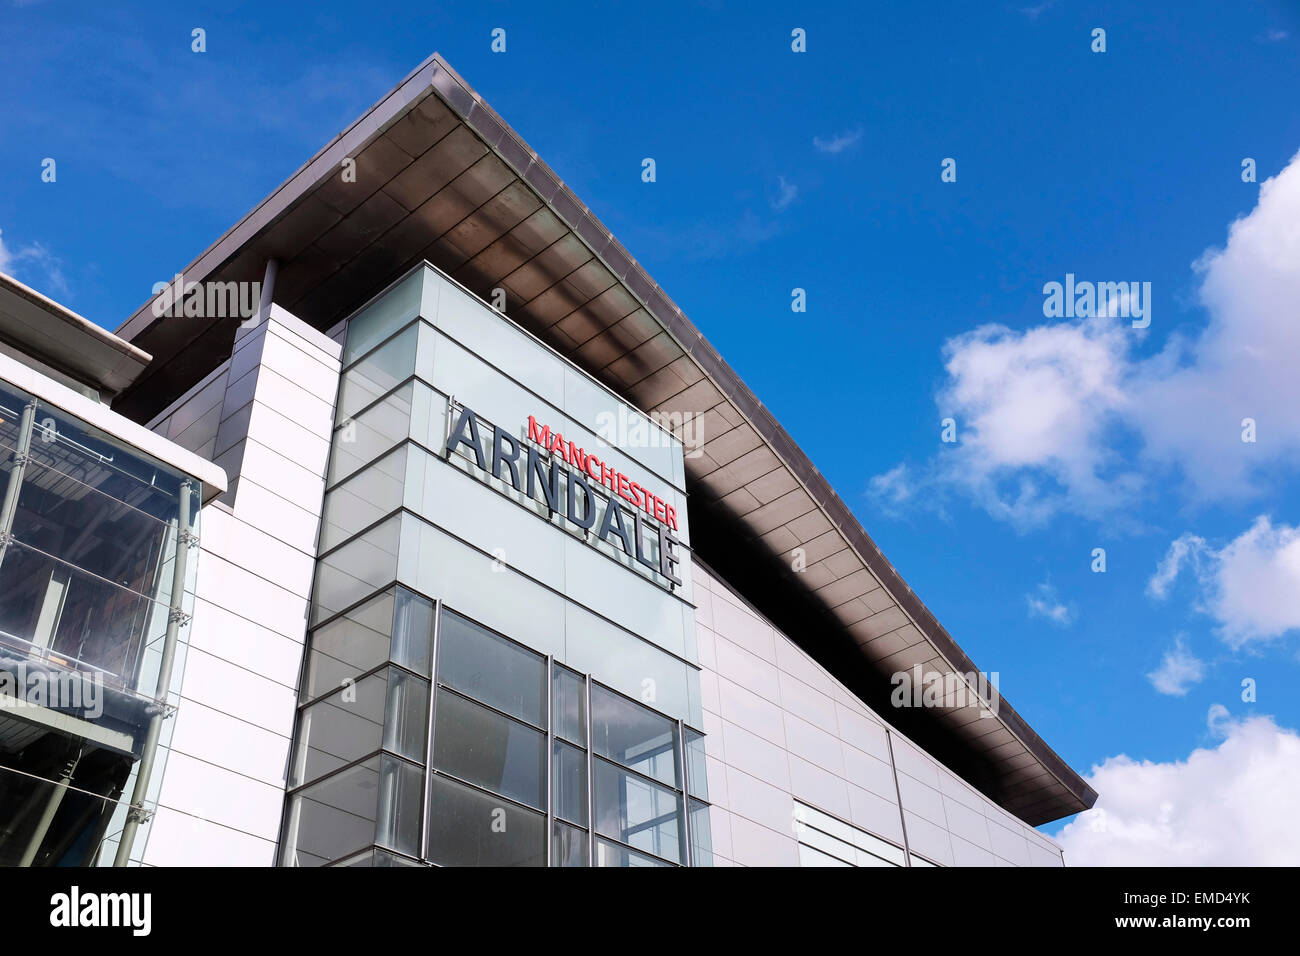 Signage on the Manchester Arndale shopping centre UK - Stock Image